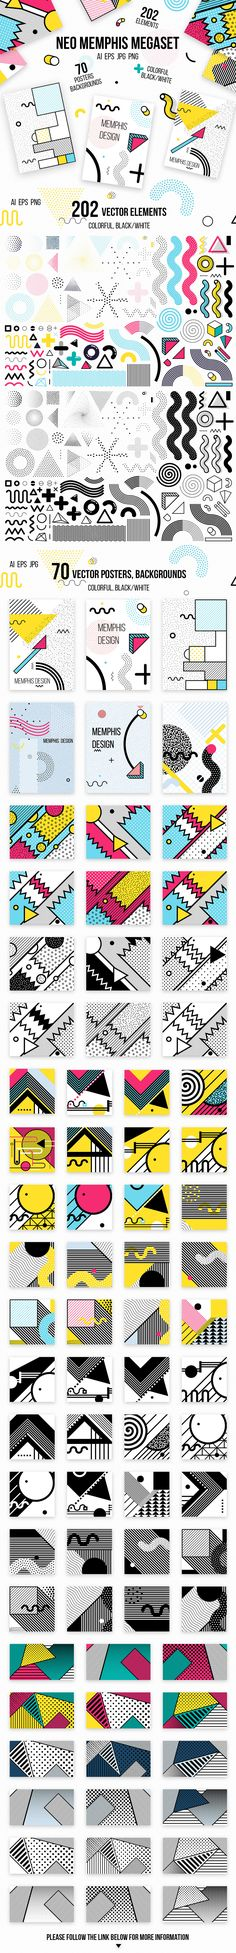 272 patterns, posters, elements. MEMPHIS MEGAset on Behance